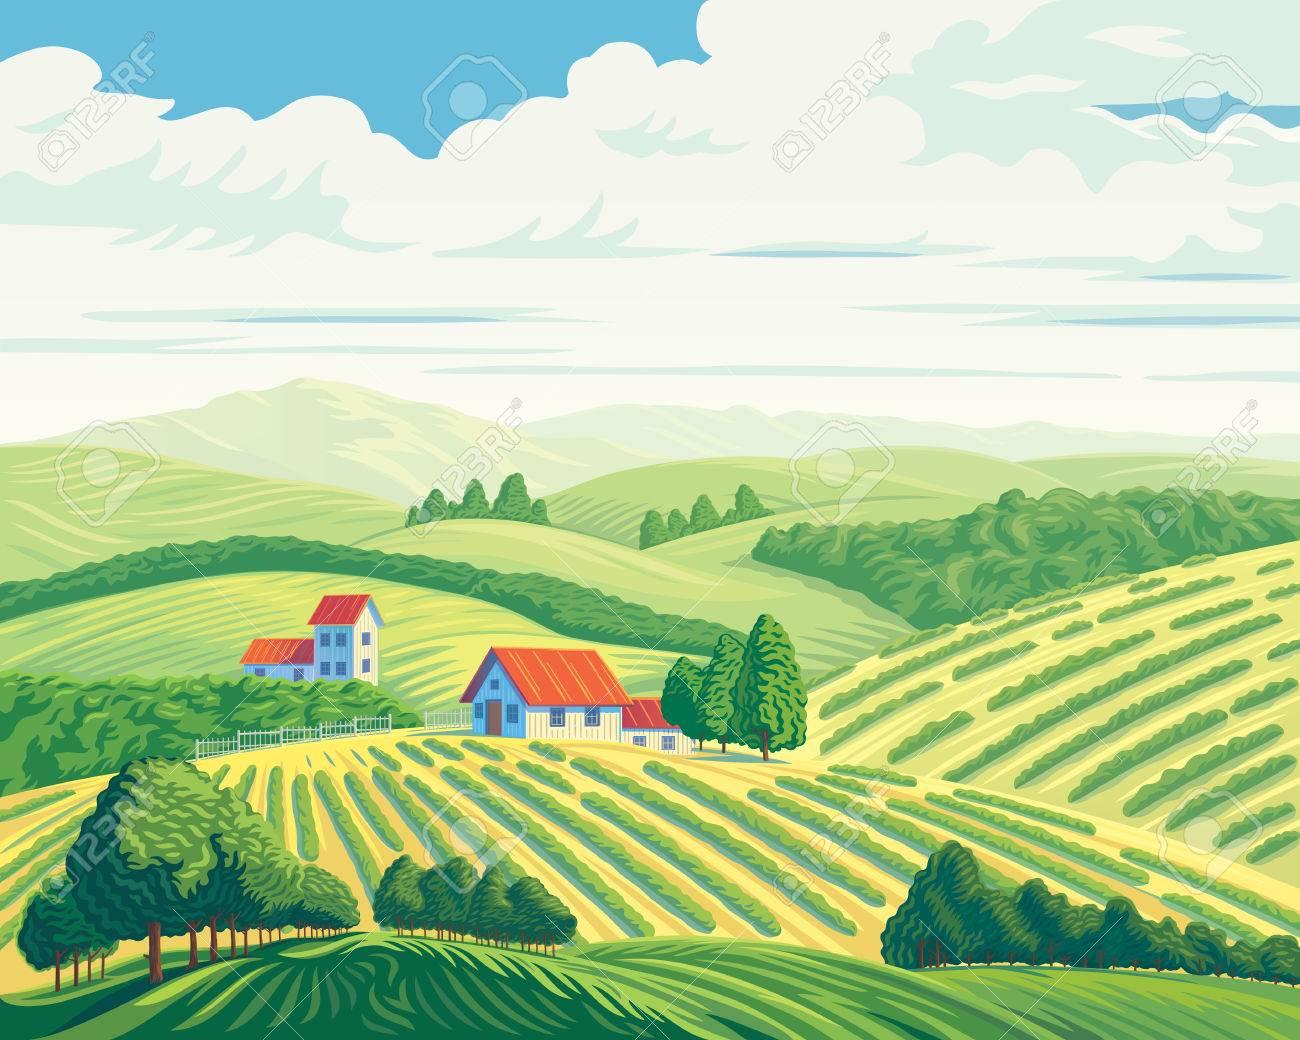 Rural summer landscape with hills and village. - 75170939